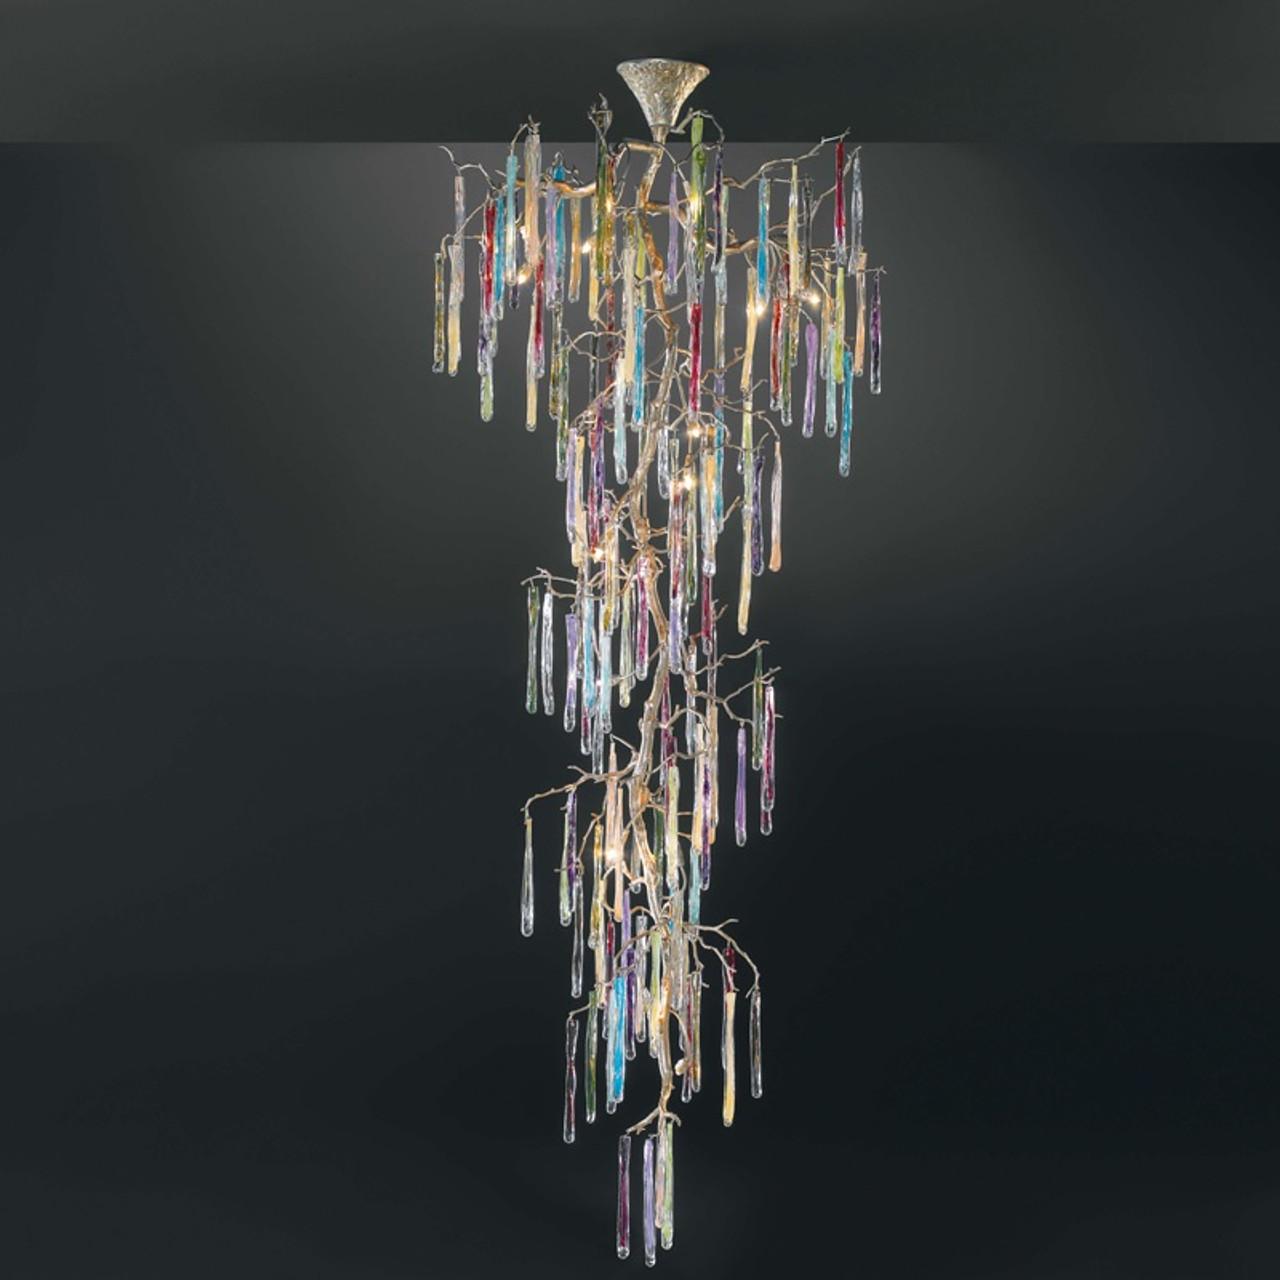 Elle Italian Artistic Colourful Crystal Branch Chandelier